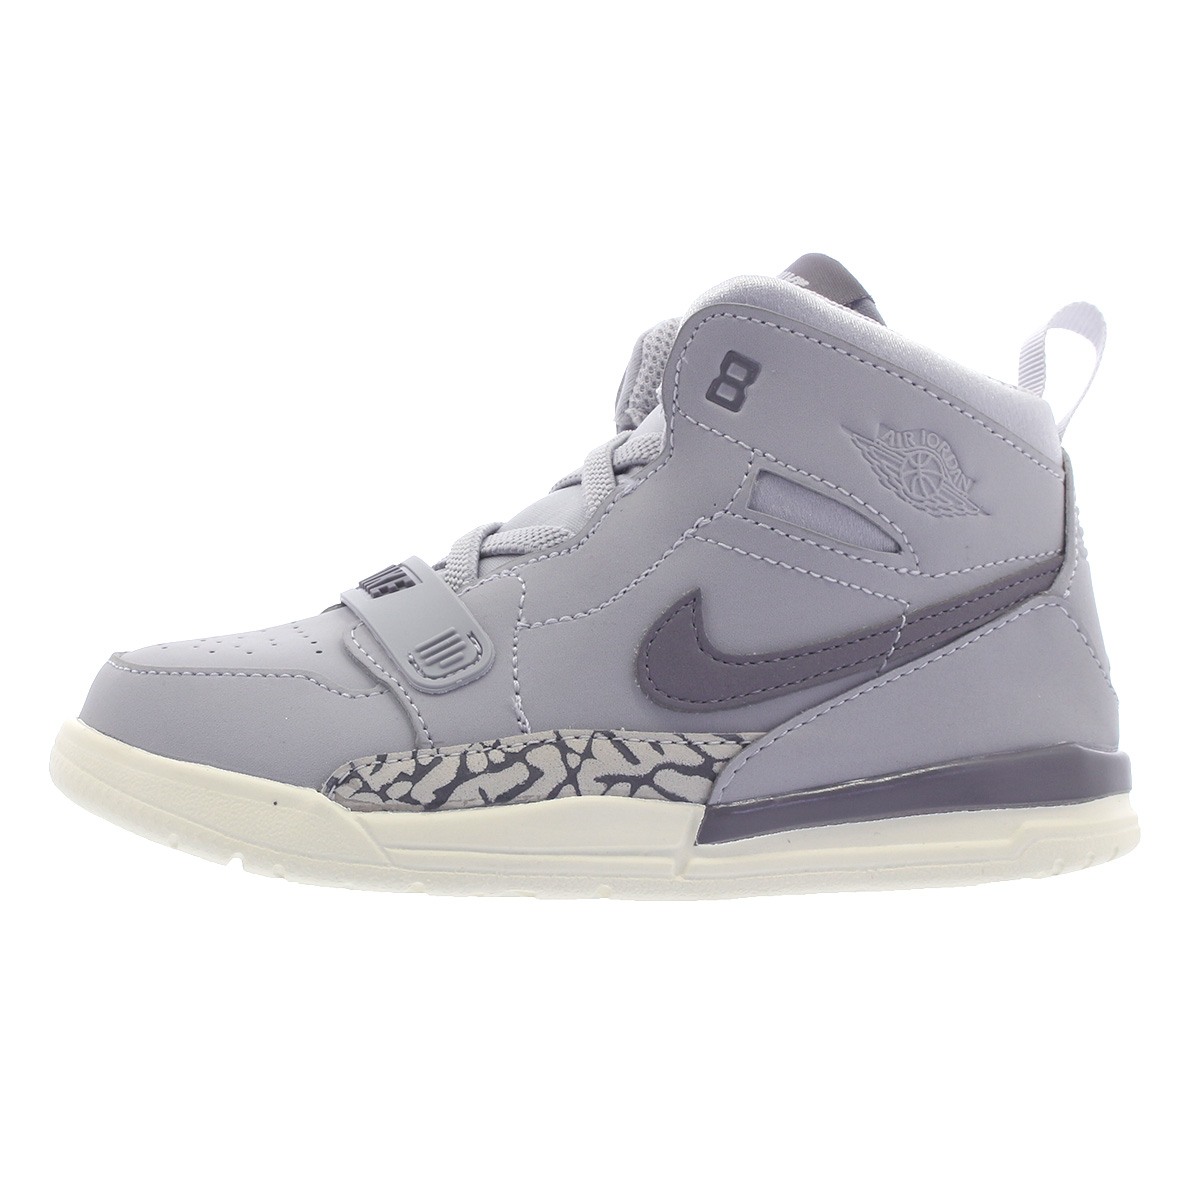 the latest 11ff4 9463f NIKE AIR JORDAN LEGACY 312 TD Nike Air Jordan Legacy 312 toddler WOLF  GREY/LIGHT GRAPHITE/SAIL at4055-002